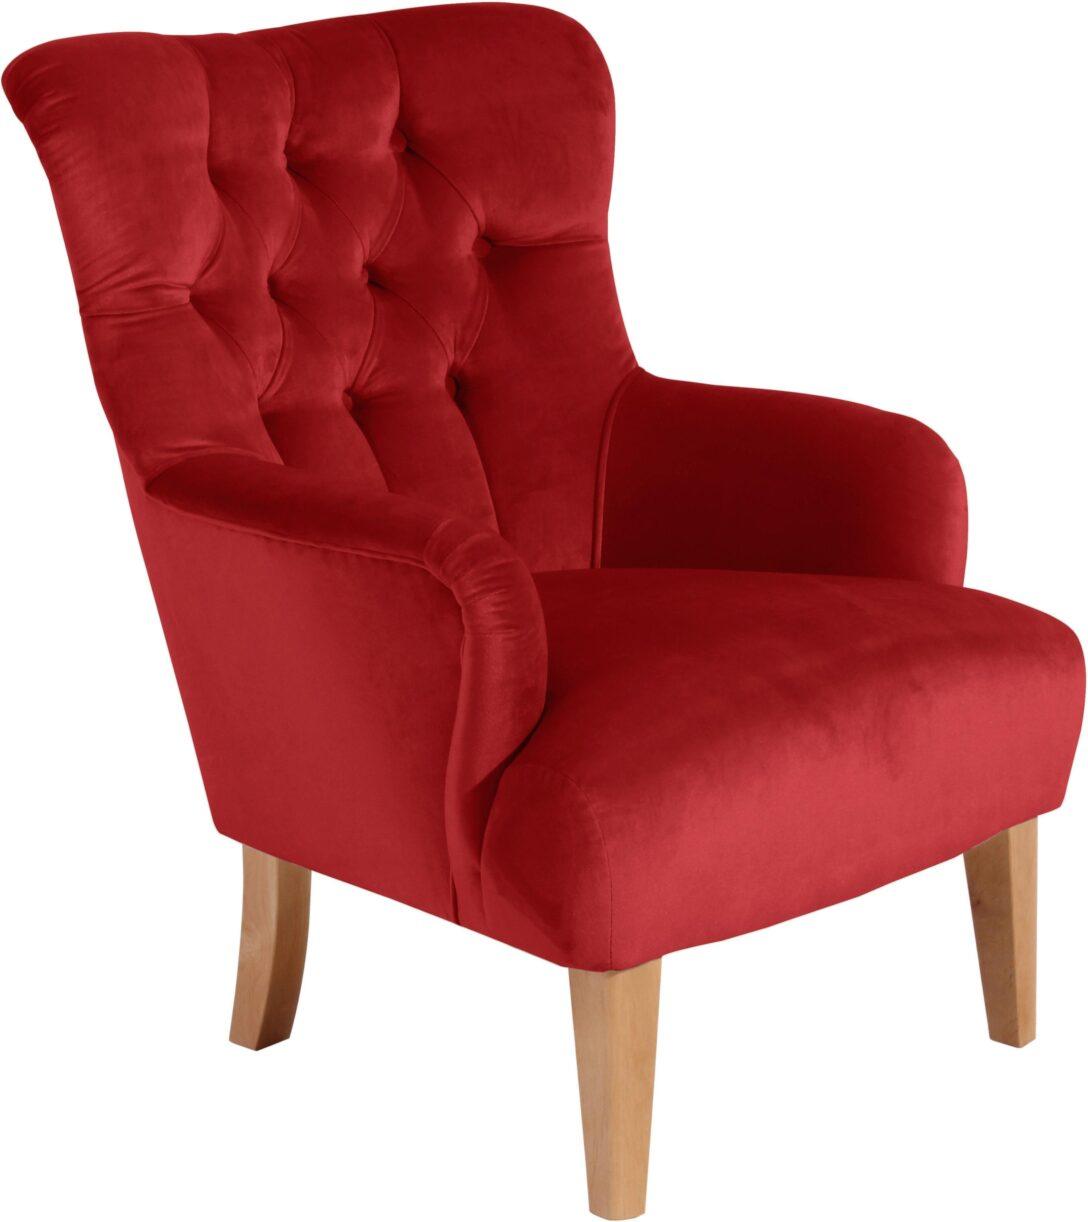 Large Size of Ikea Relaxsessel Mit Hocker Muren Leder Garten Strandmon Elektrisch Sessel Schlafsessel Lycksele Lvs Ohrensessel Modern Xxl Küche Kaufen Miniküche Wohnzimmer Ikea Relaxsessel